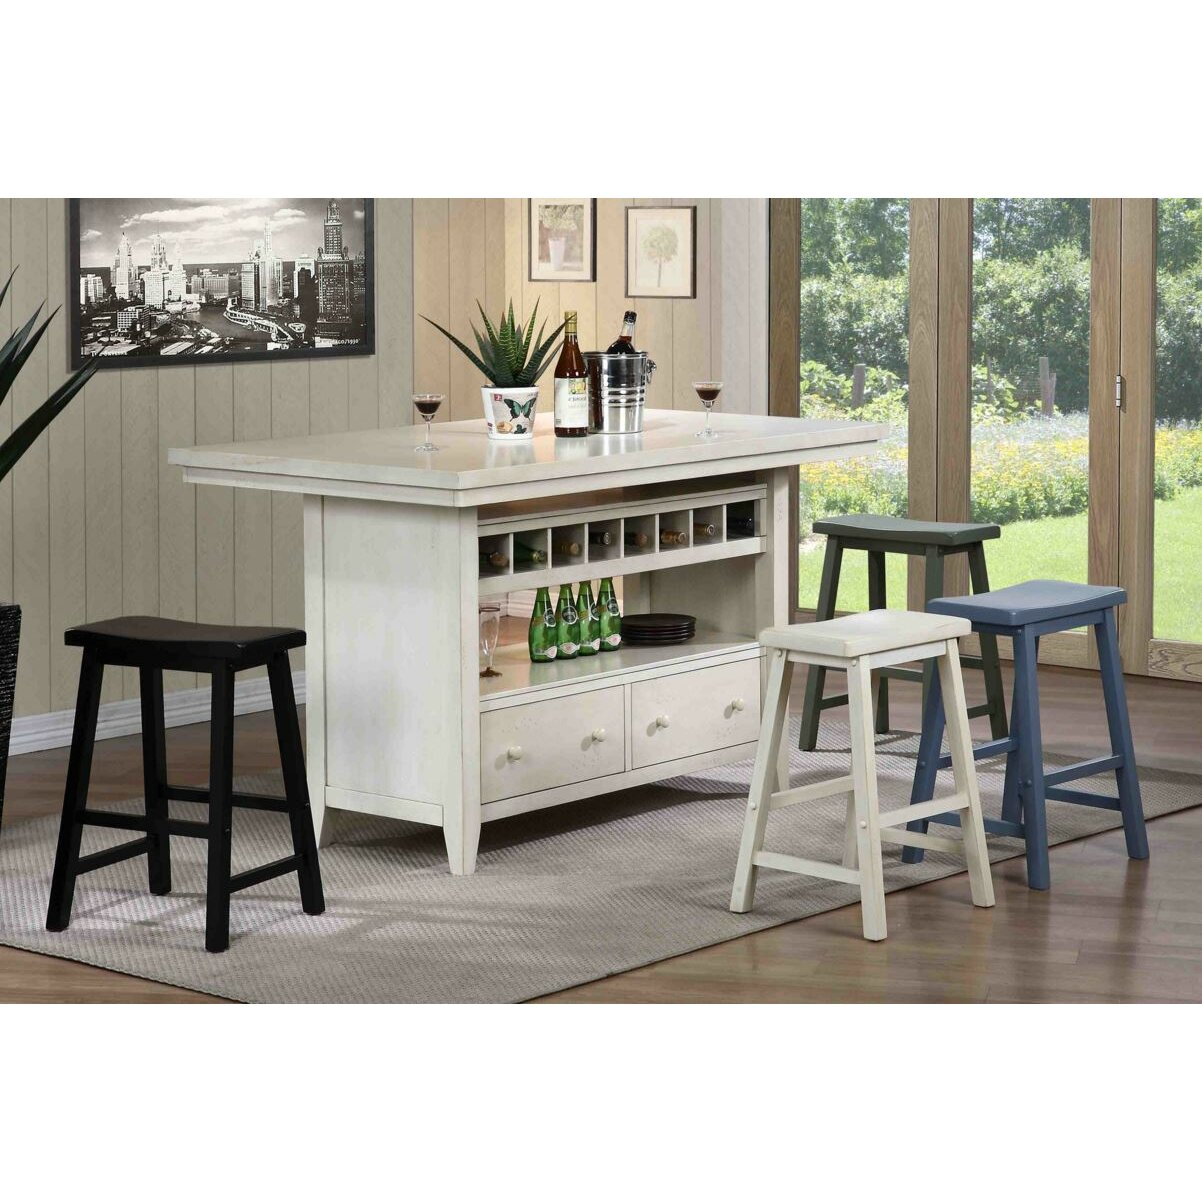 Eci Furniture Four Seasons Kitchen Island Reviews